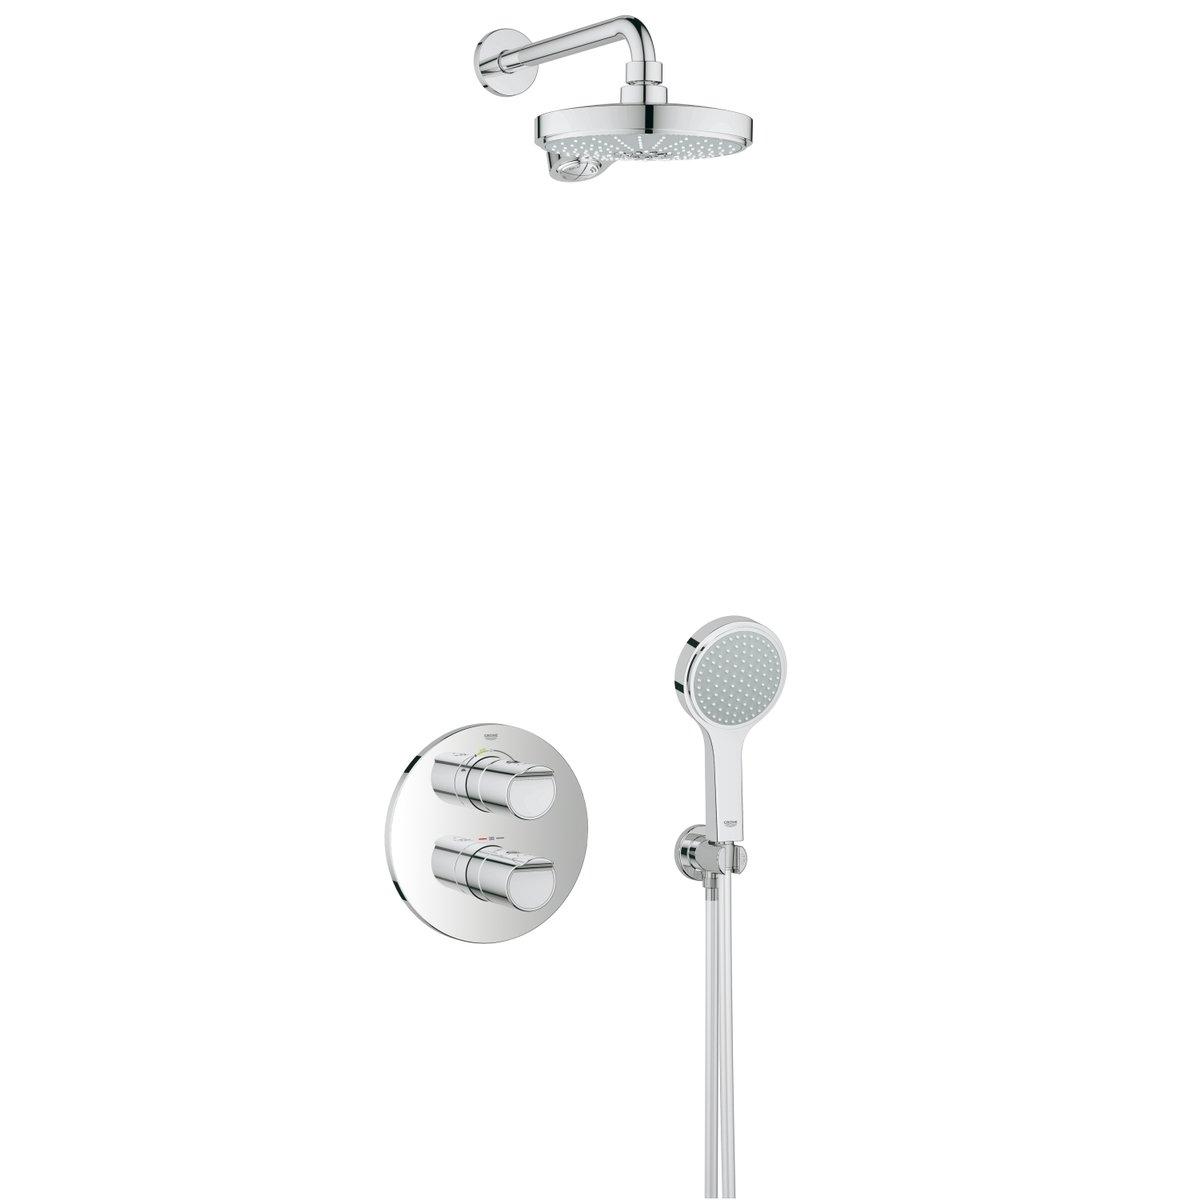 Grohe Grohtherm-2000 Perfect Shower Set m. inbouw douchekraan thermostatisch m. Power & Soul hoofd-